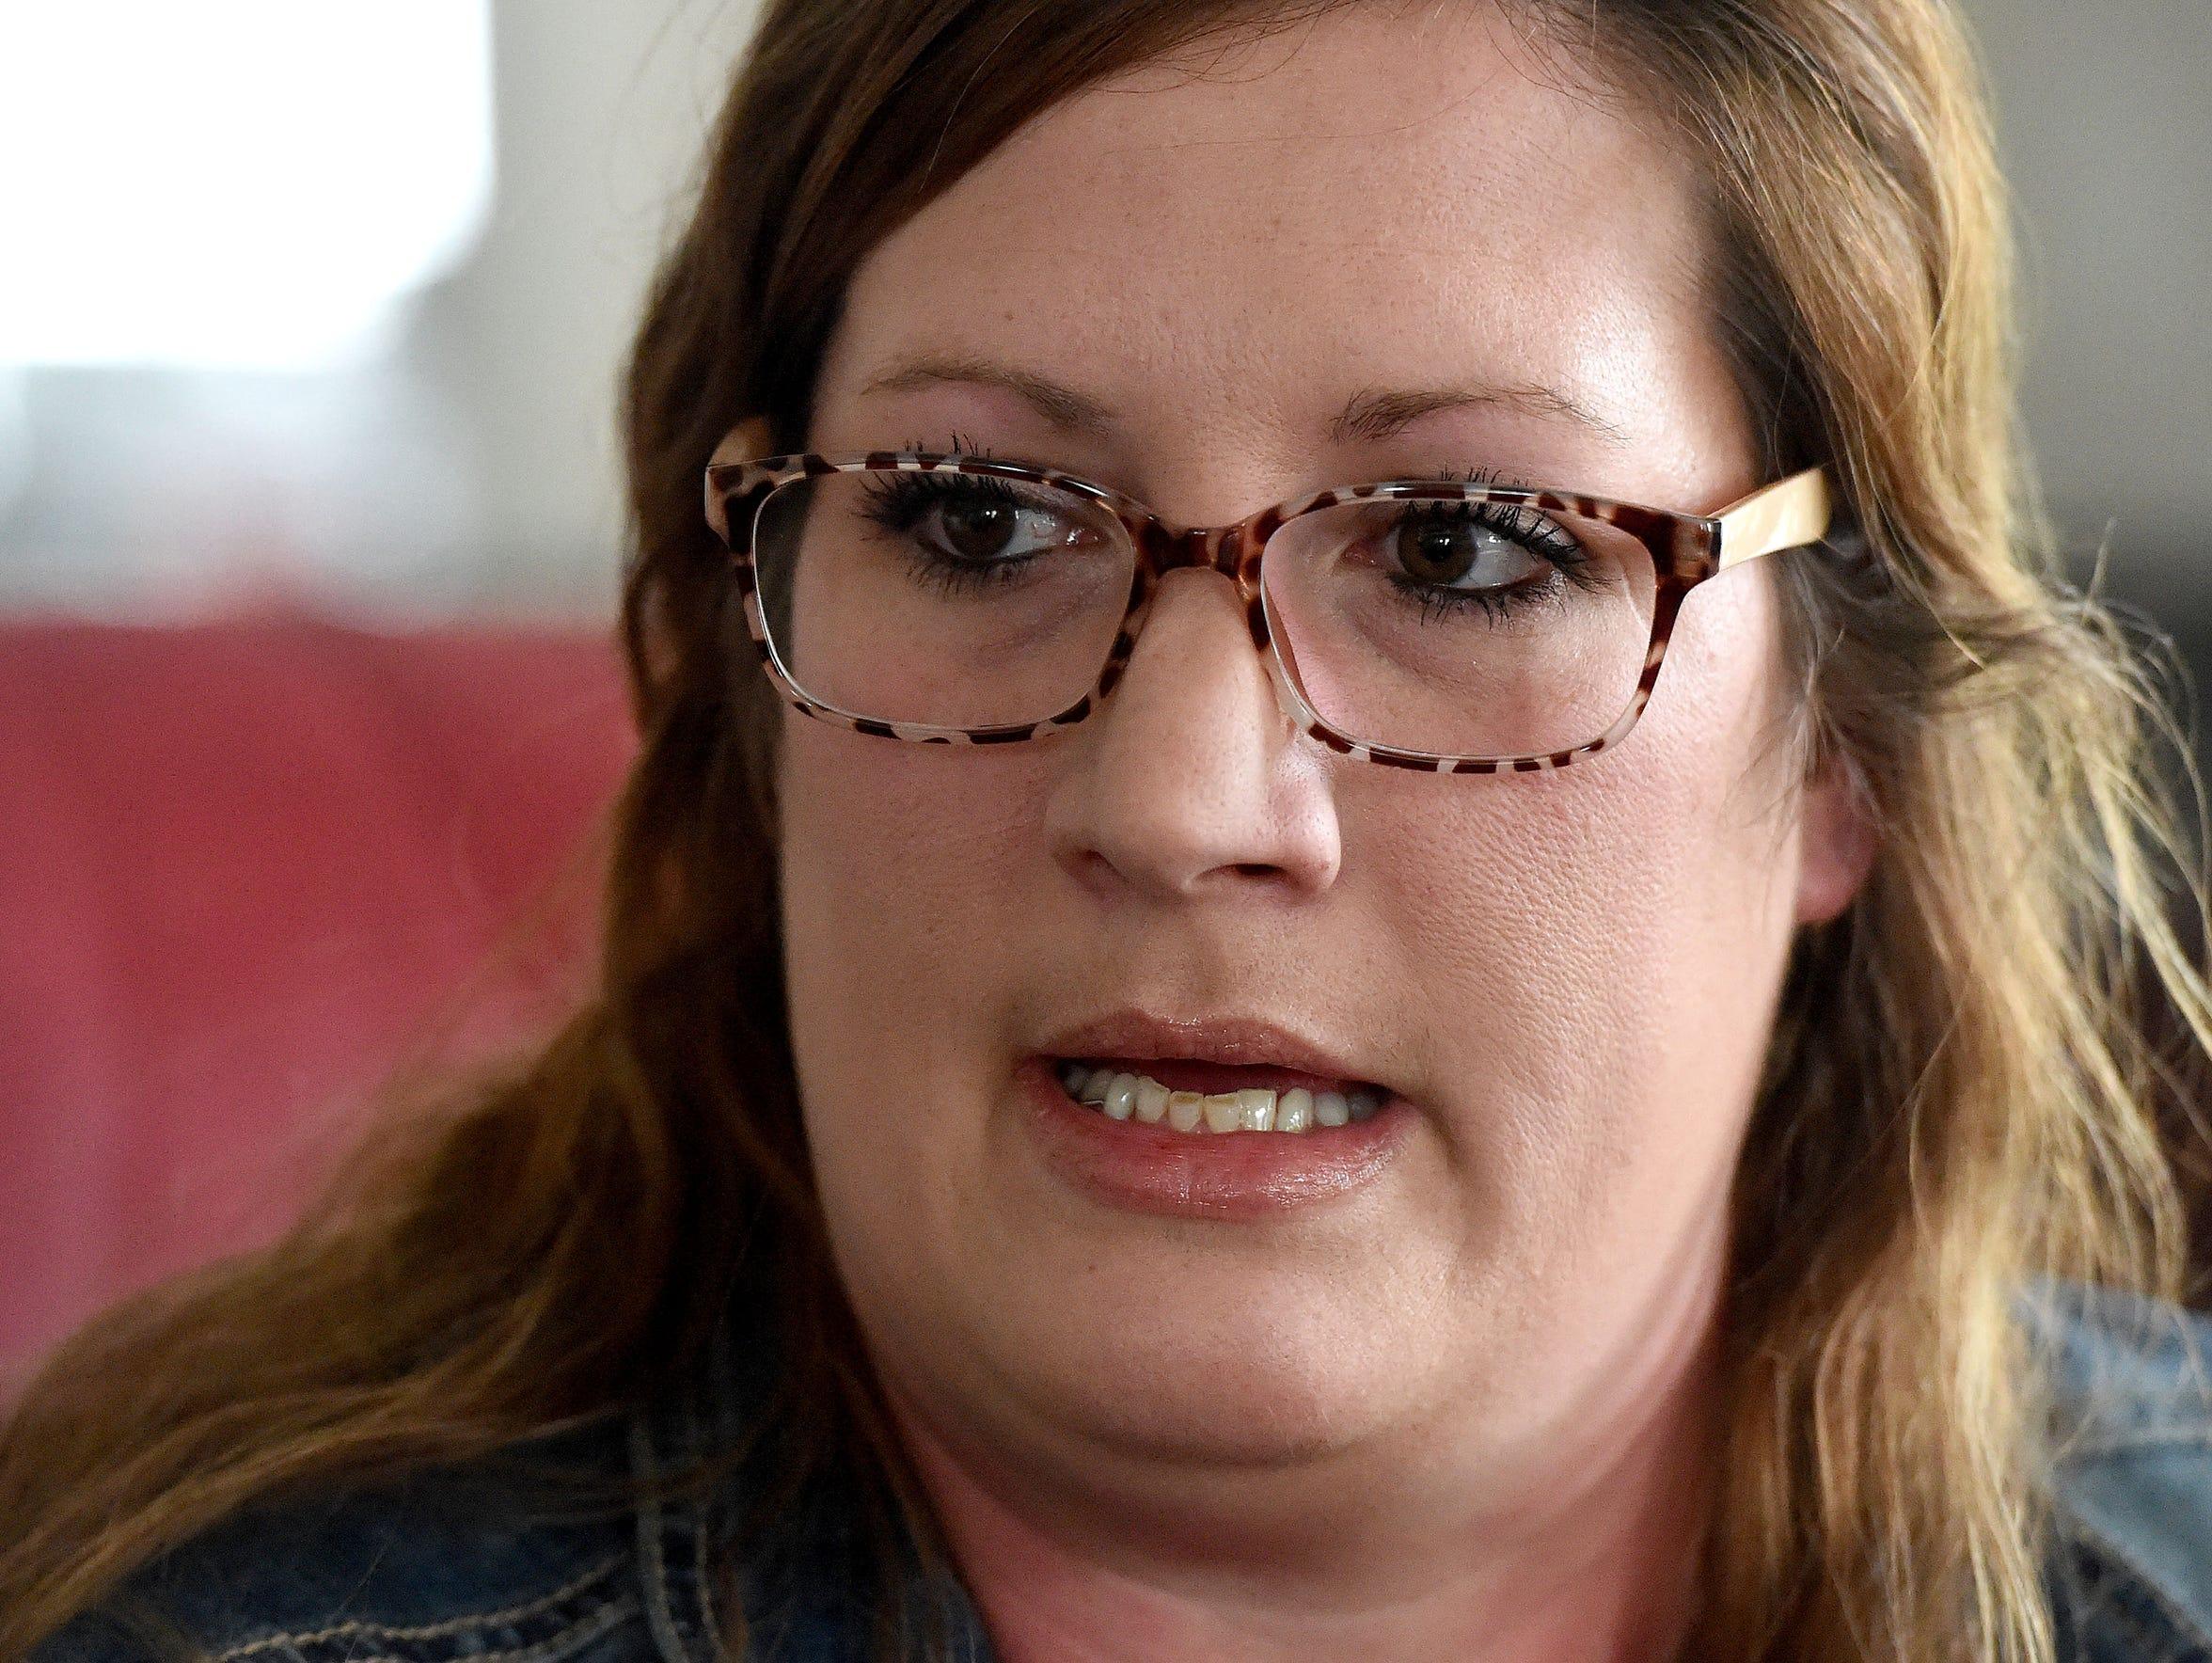 A registered nurse, Amber Rexrode of Staunton shares